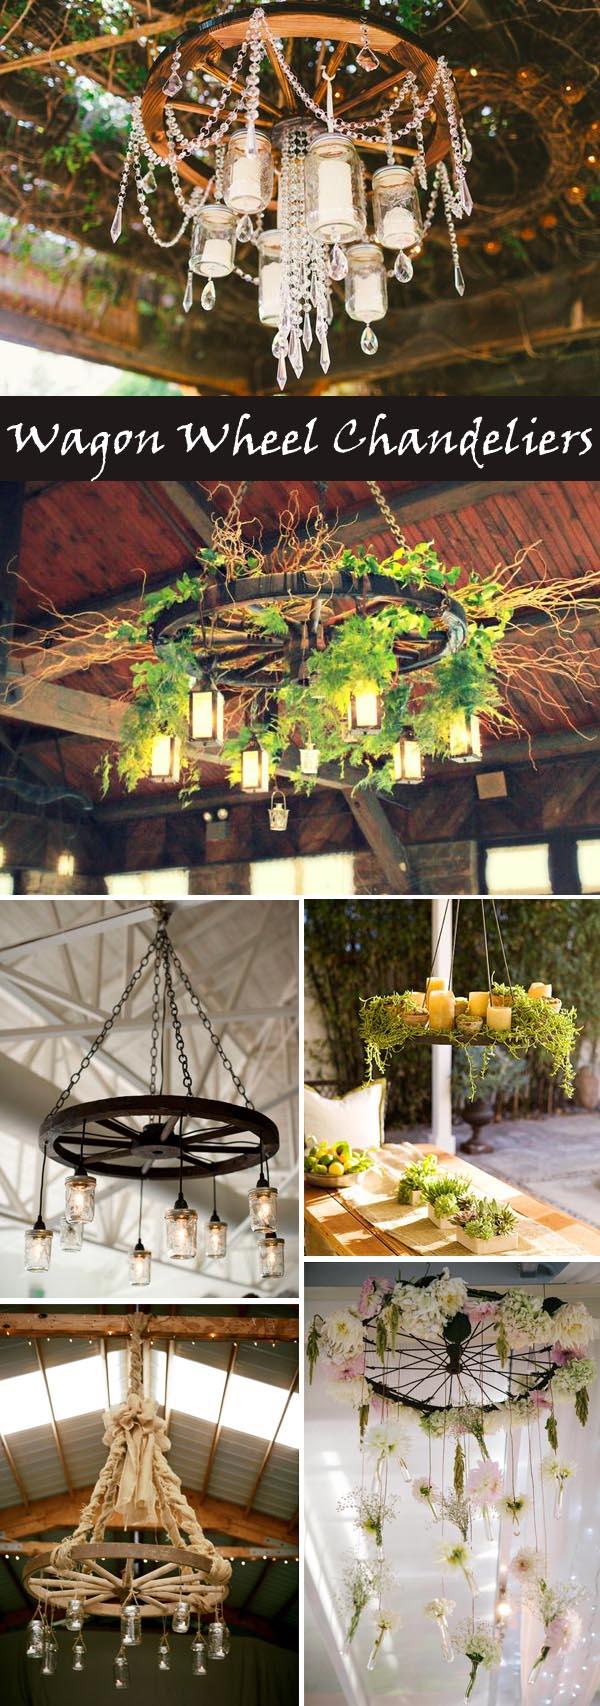 Decorating Wagon For Baby In Wedding Rustic Wedding Ideas Elegantweddinginvites Blog